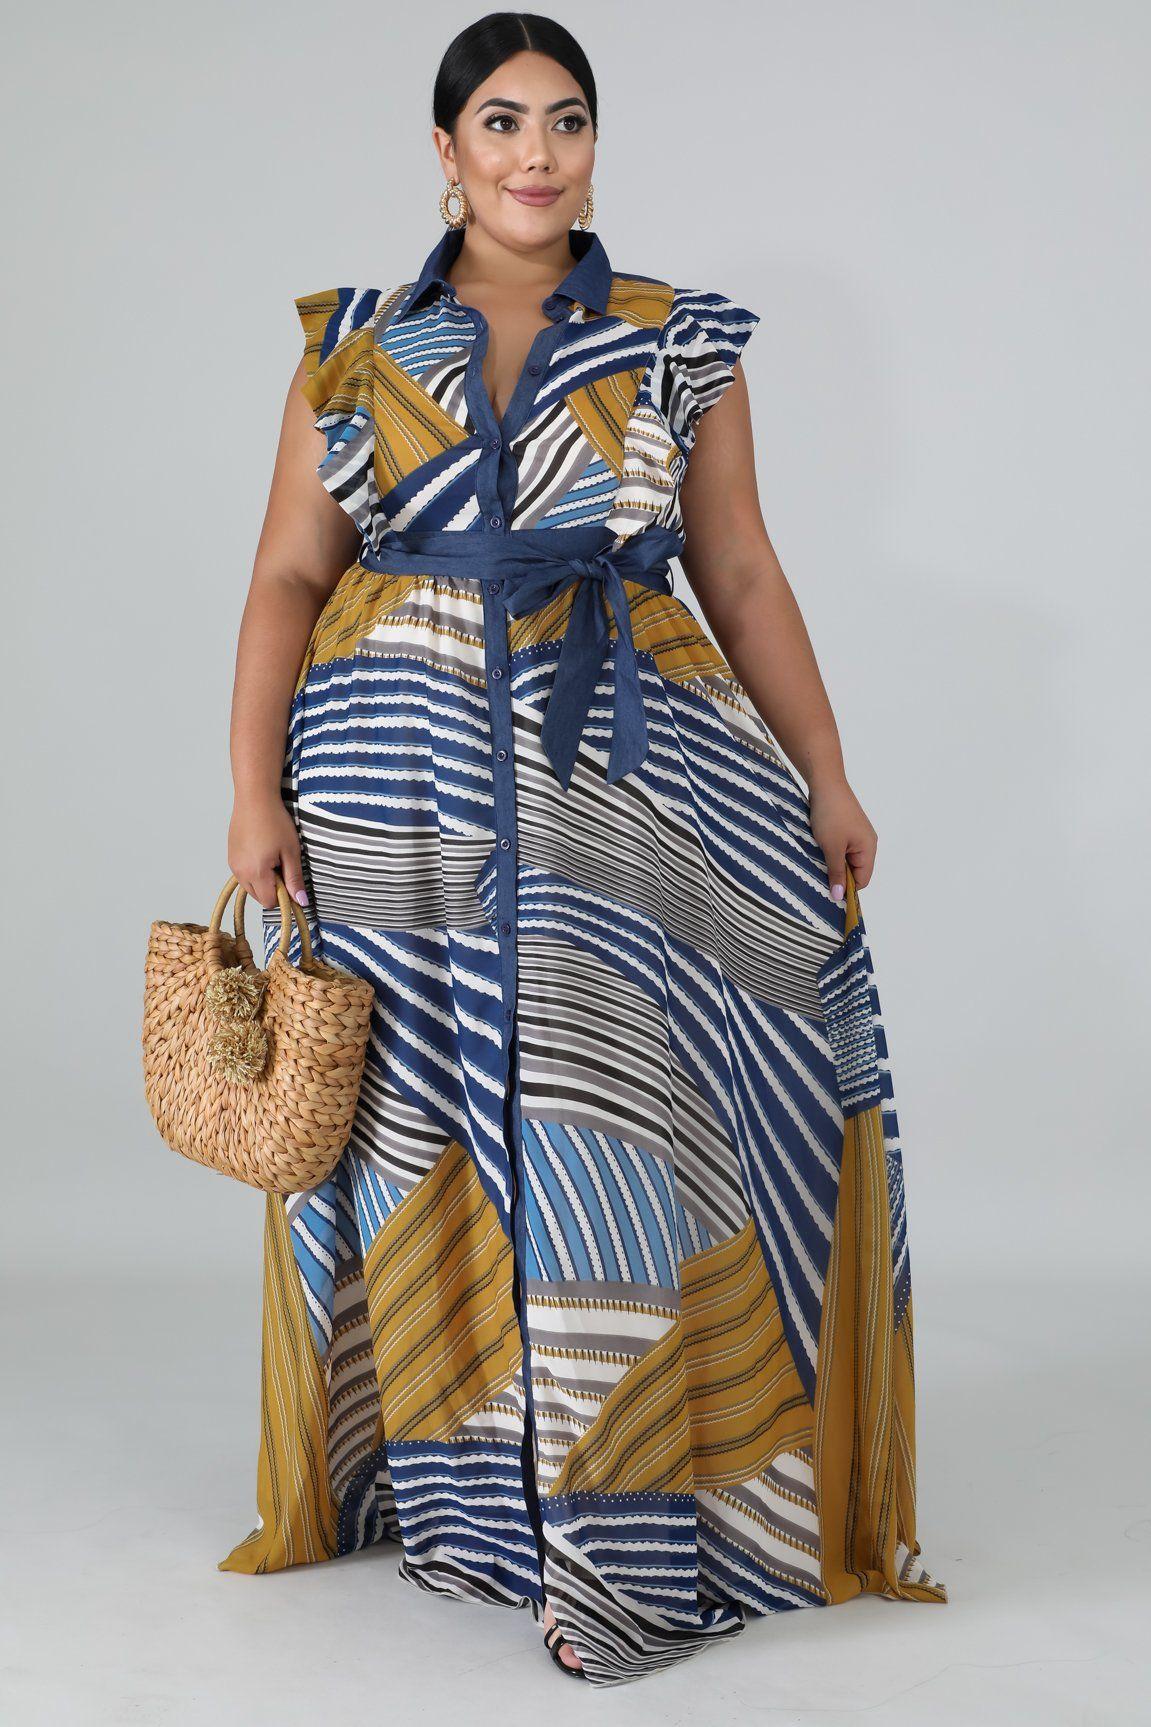 Flutter Chevron Maxi Dress Style Gt19253 Xdescriptionthis Flutter Chevron Maxi Dress Features A Chevron Dress Maxi Maxi Dress Latest African Fashion Dresses [ 1727 x 1151 Pixel ]